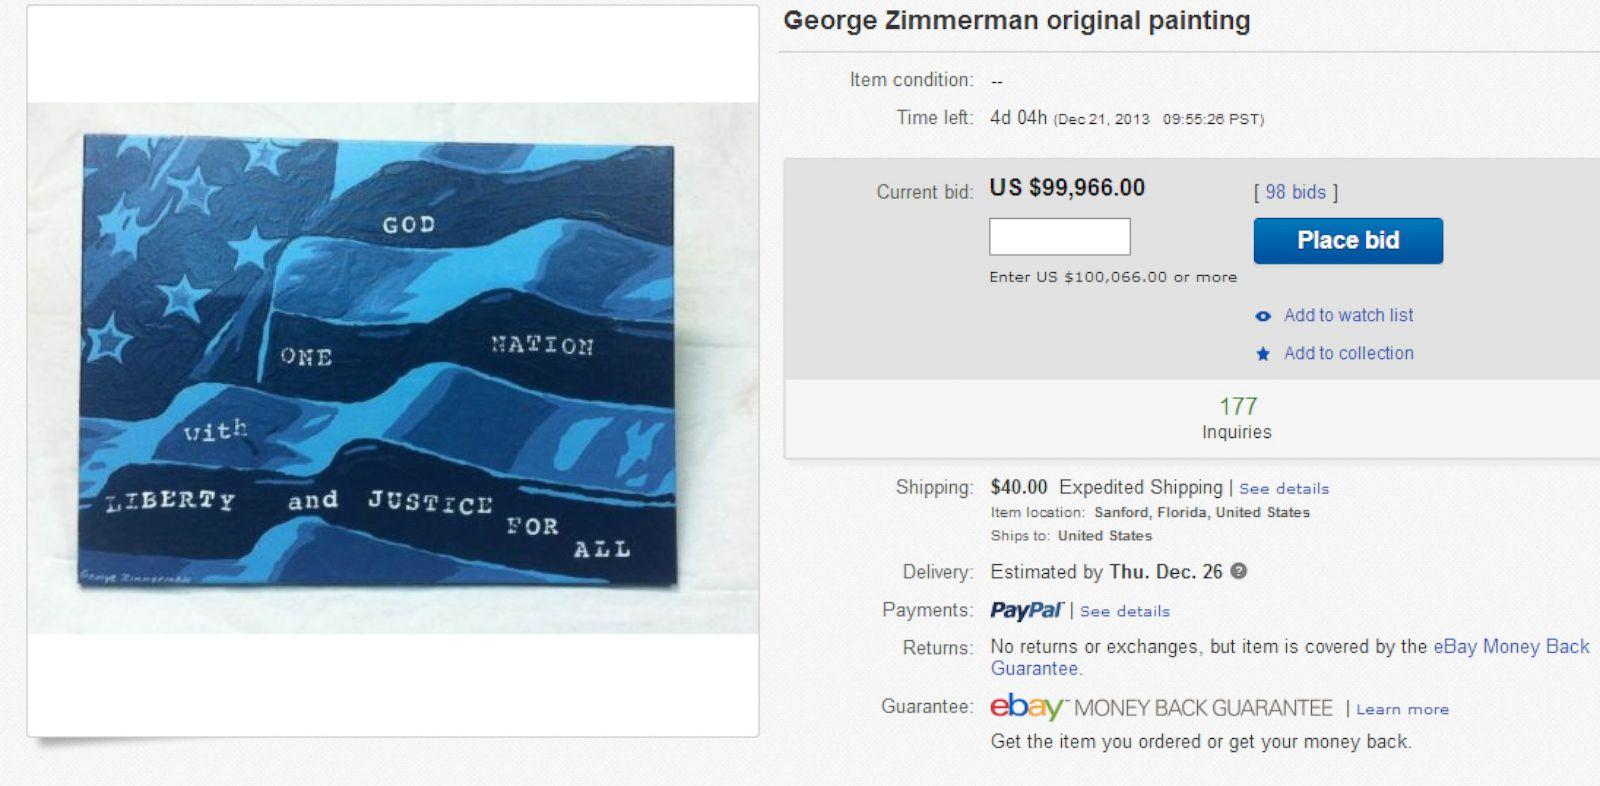 PHOTO: George Zimmermans original painting is being sold on ebay